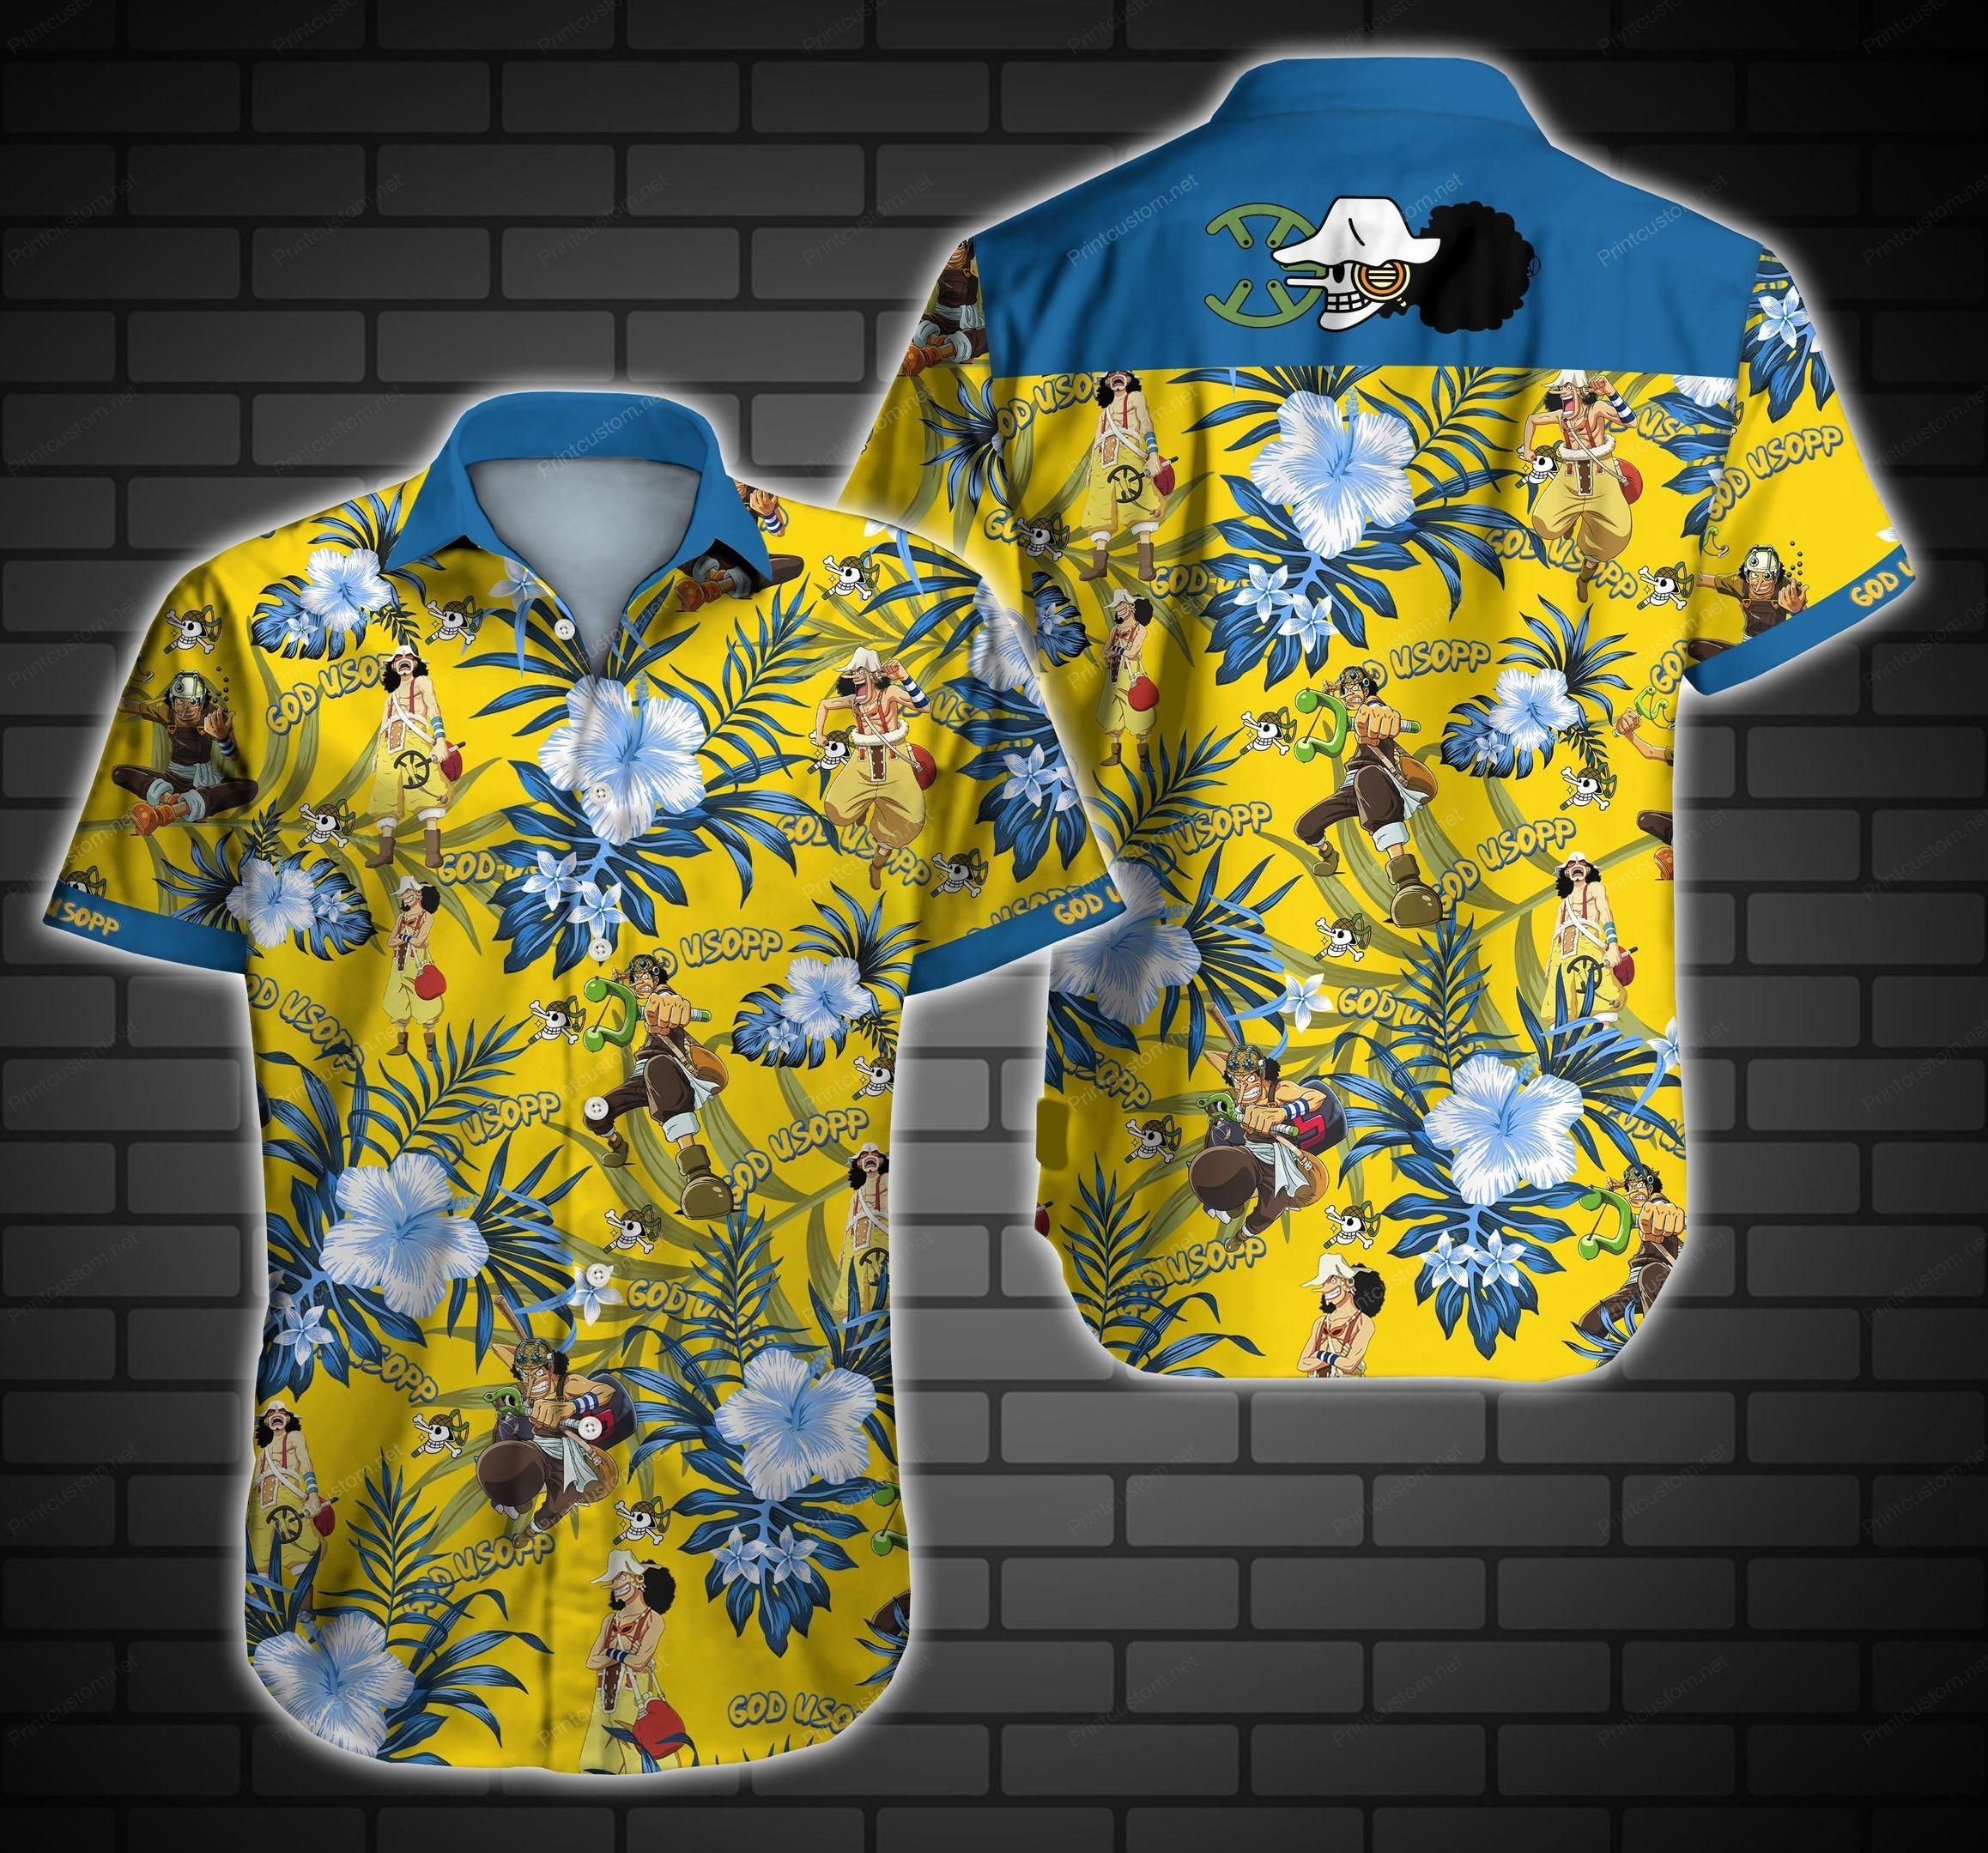 God Usopp One Piece Hawaiian Shirt Summer Shirt